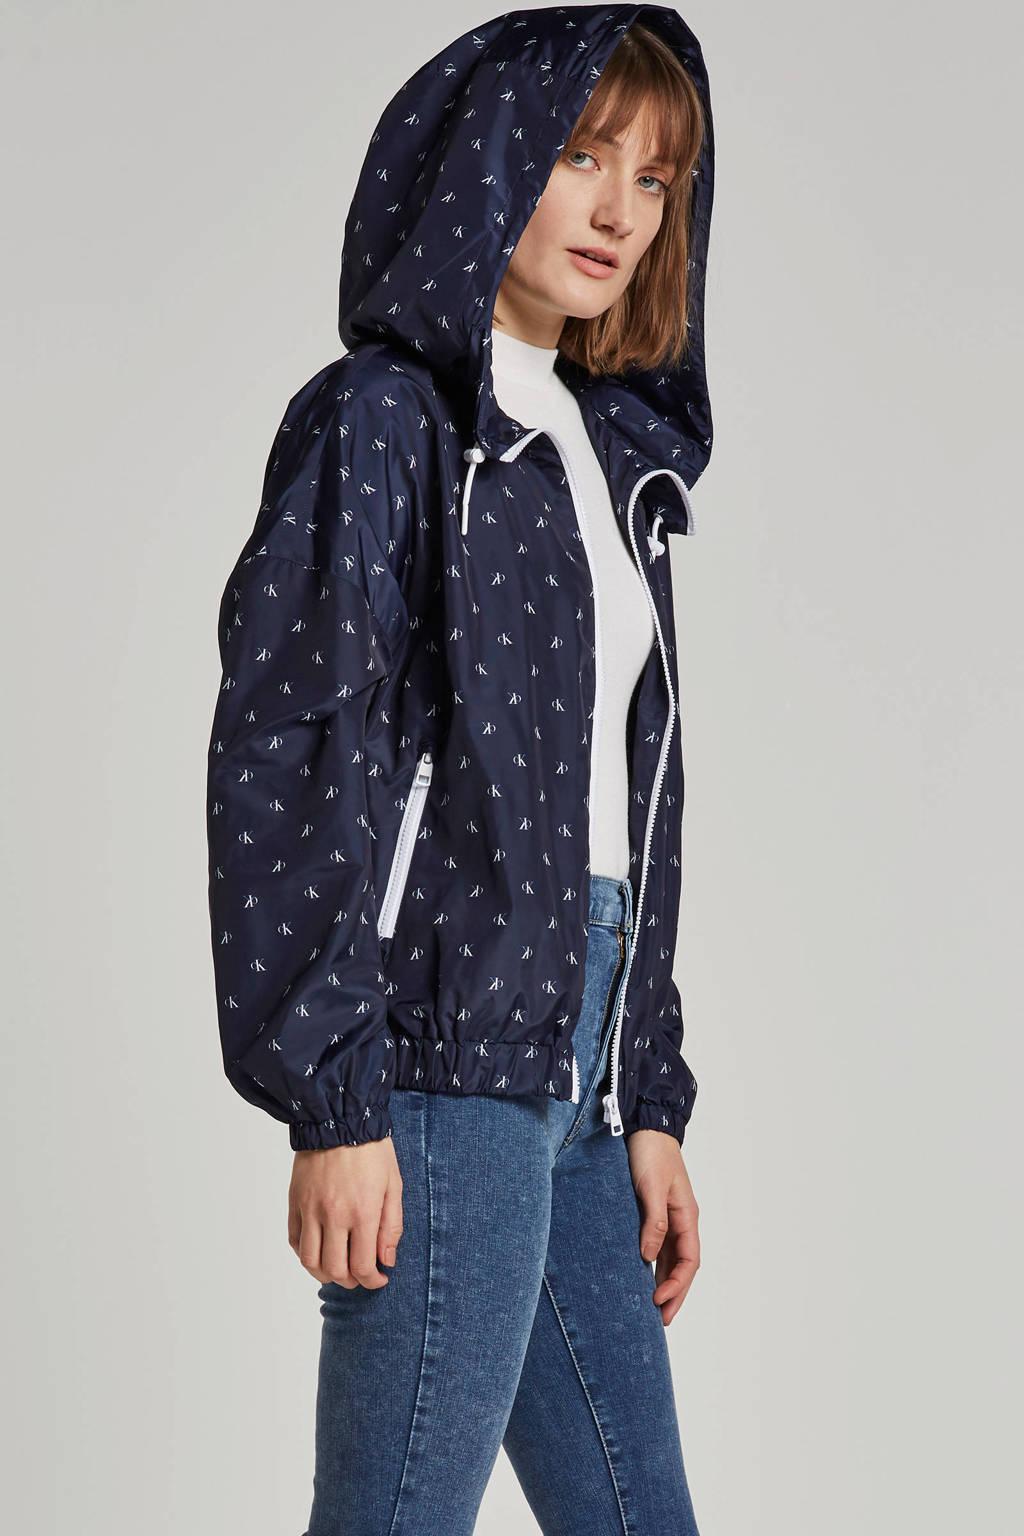 Calvin Klein Jeans jas met logo opdruk, Donkerblauw